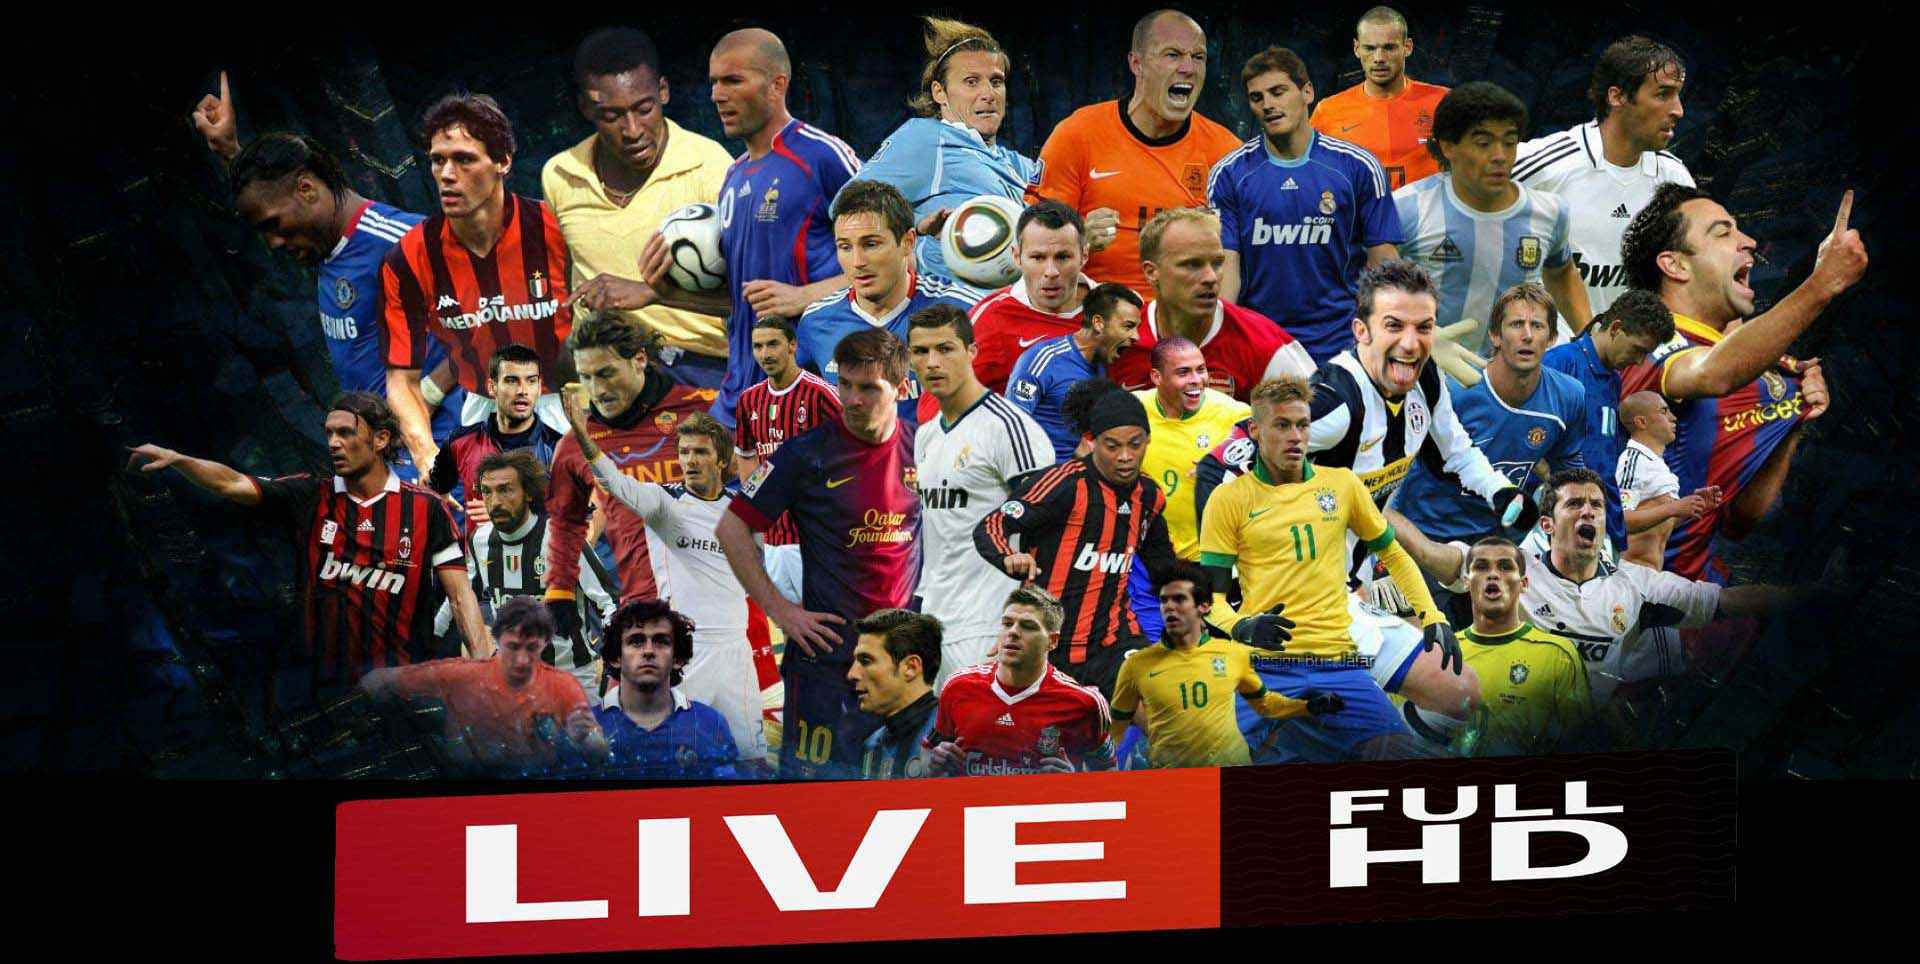 Real Madrid Vs Juventus Final live stream